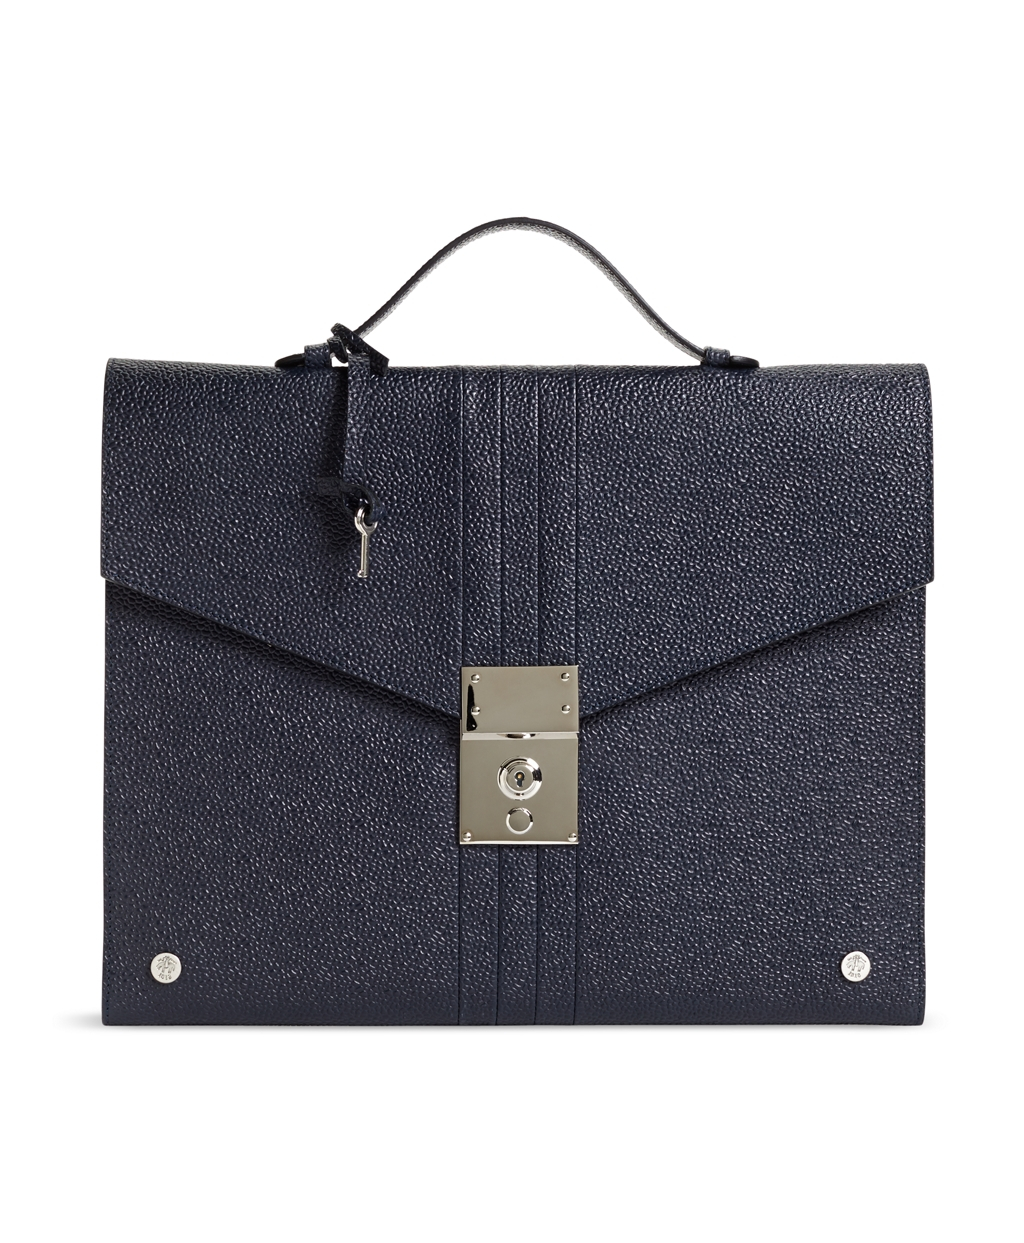 cole haan briefcase photo - 1